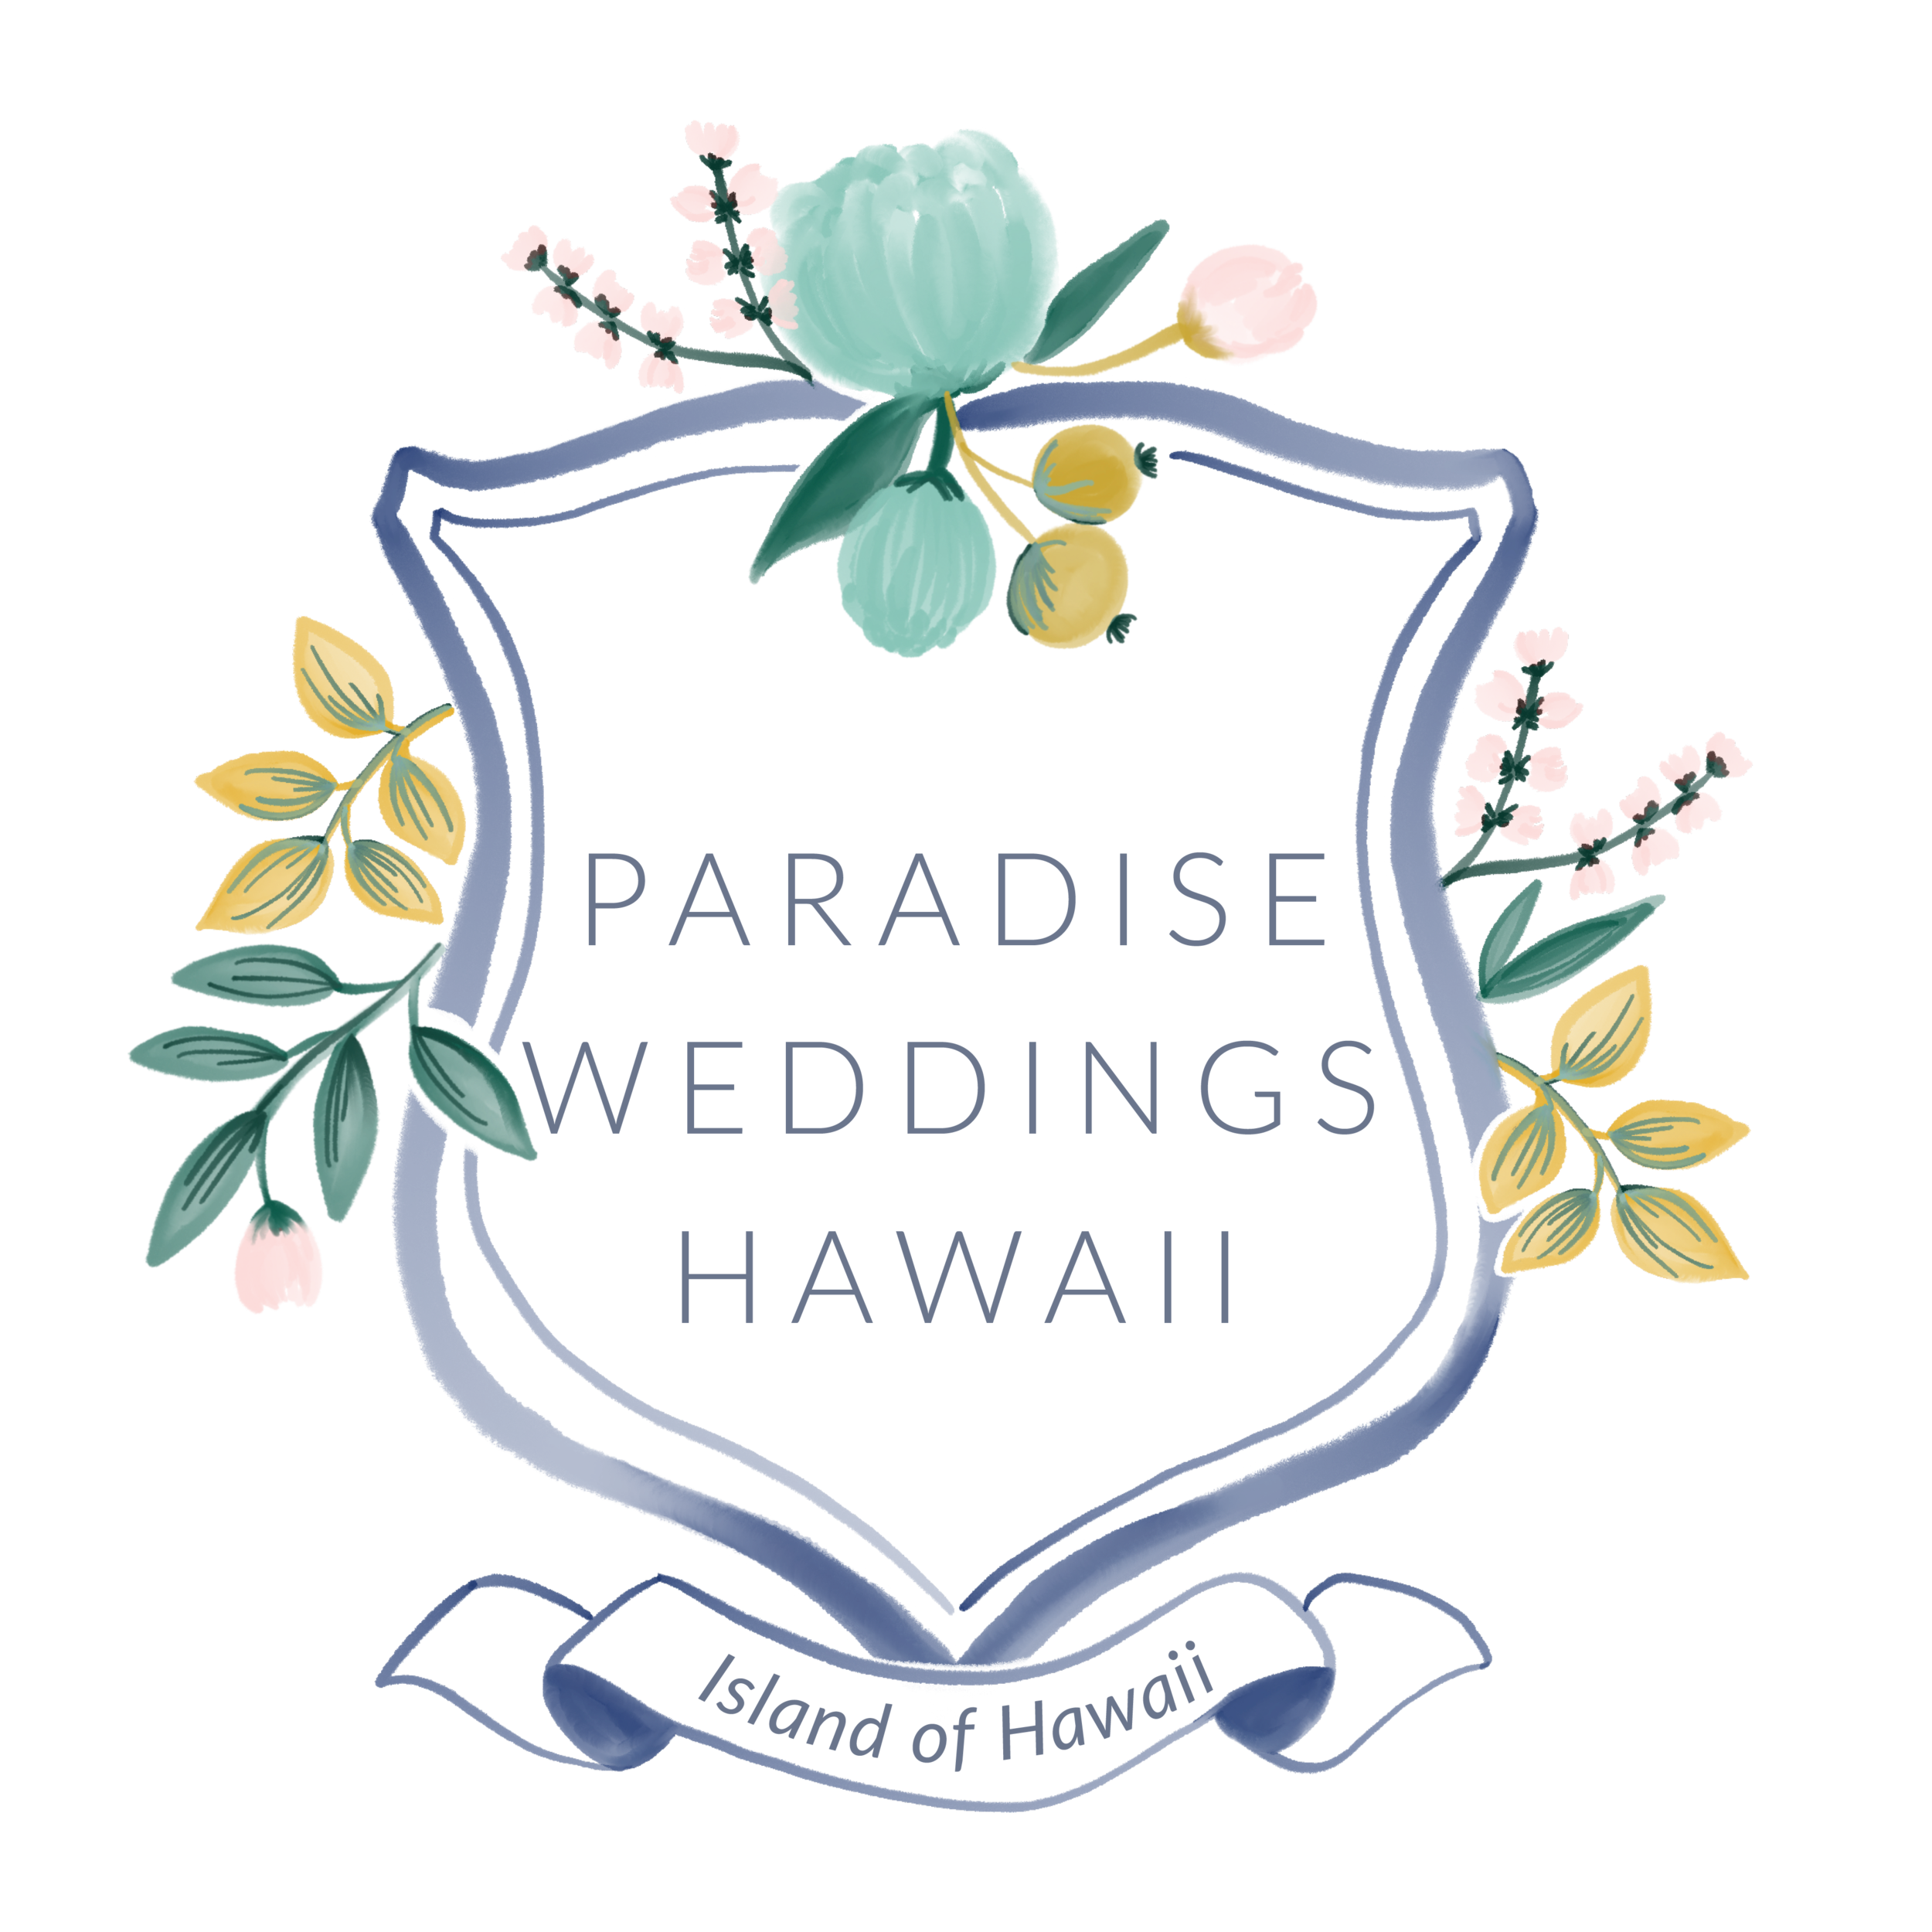 Paradise_Weddings_Hawaii.png